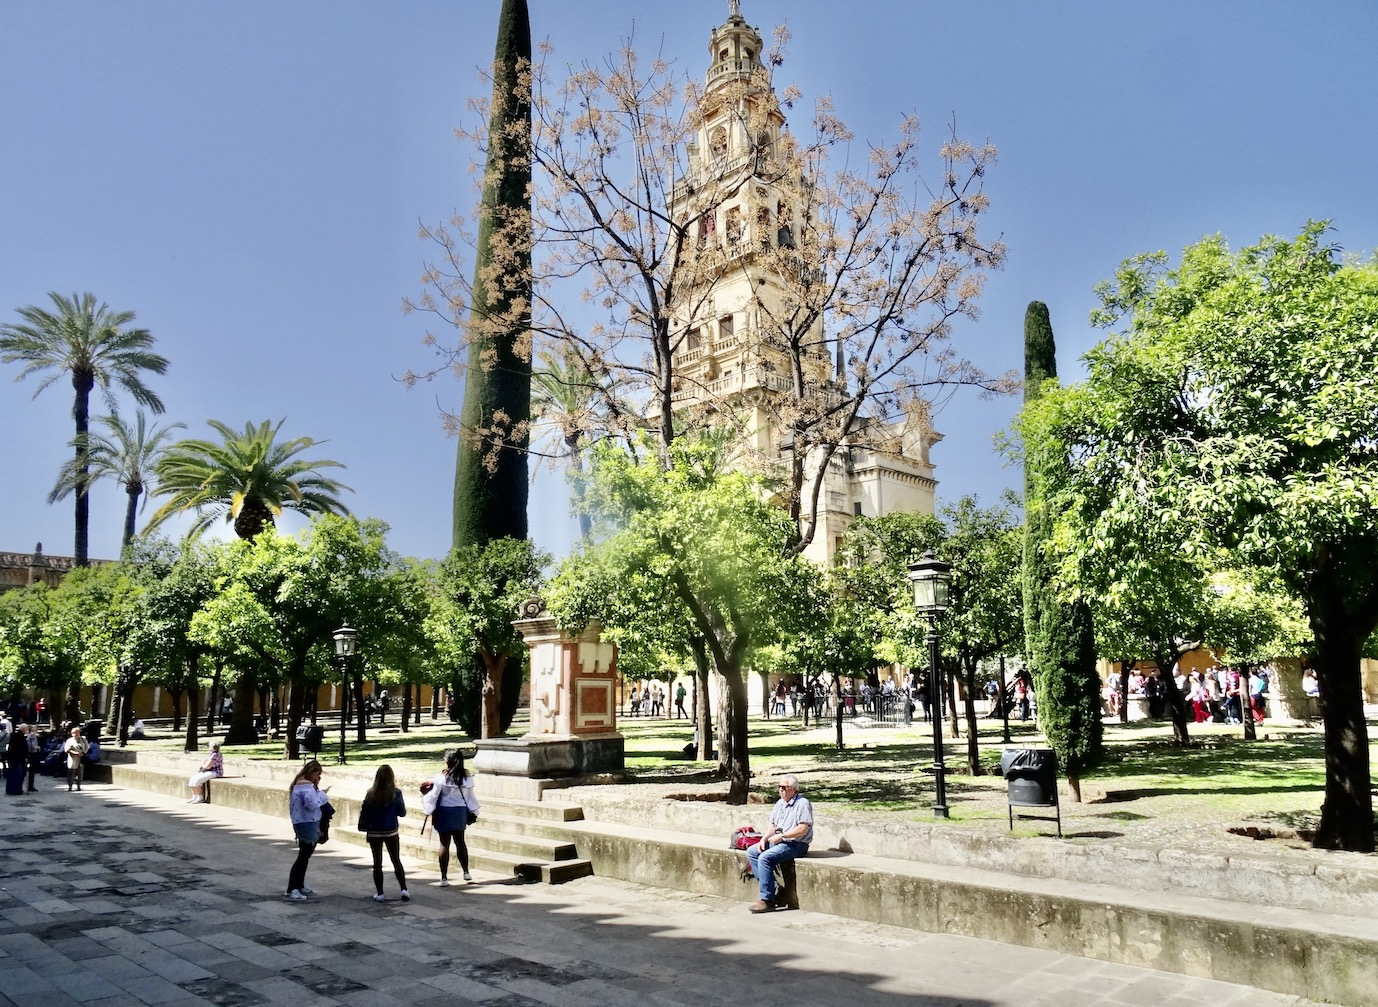 Courtyard of the Orange Trees Cordoba Spain.